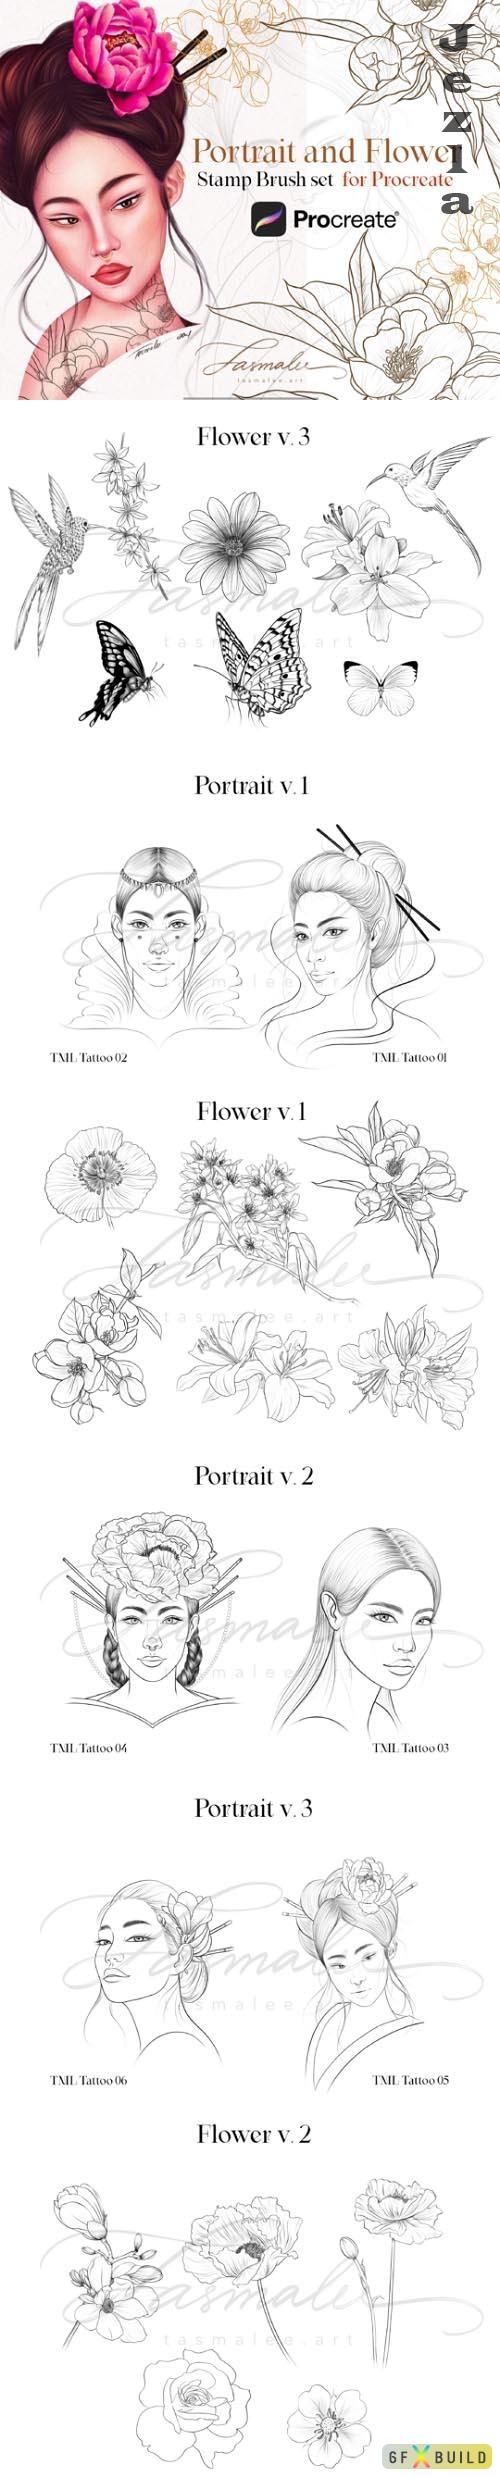 Procreate Portrait Stamps Brush Set